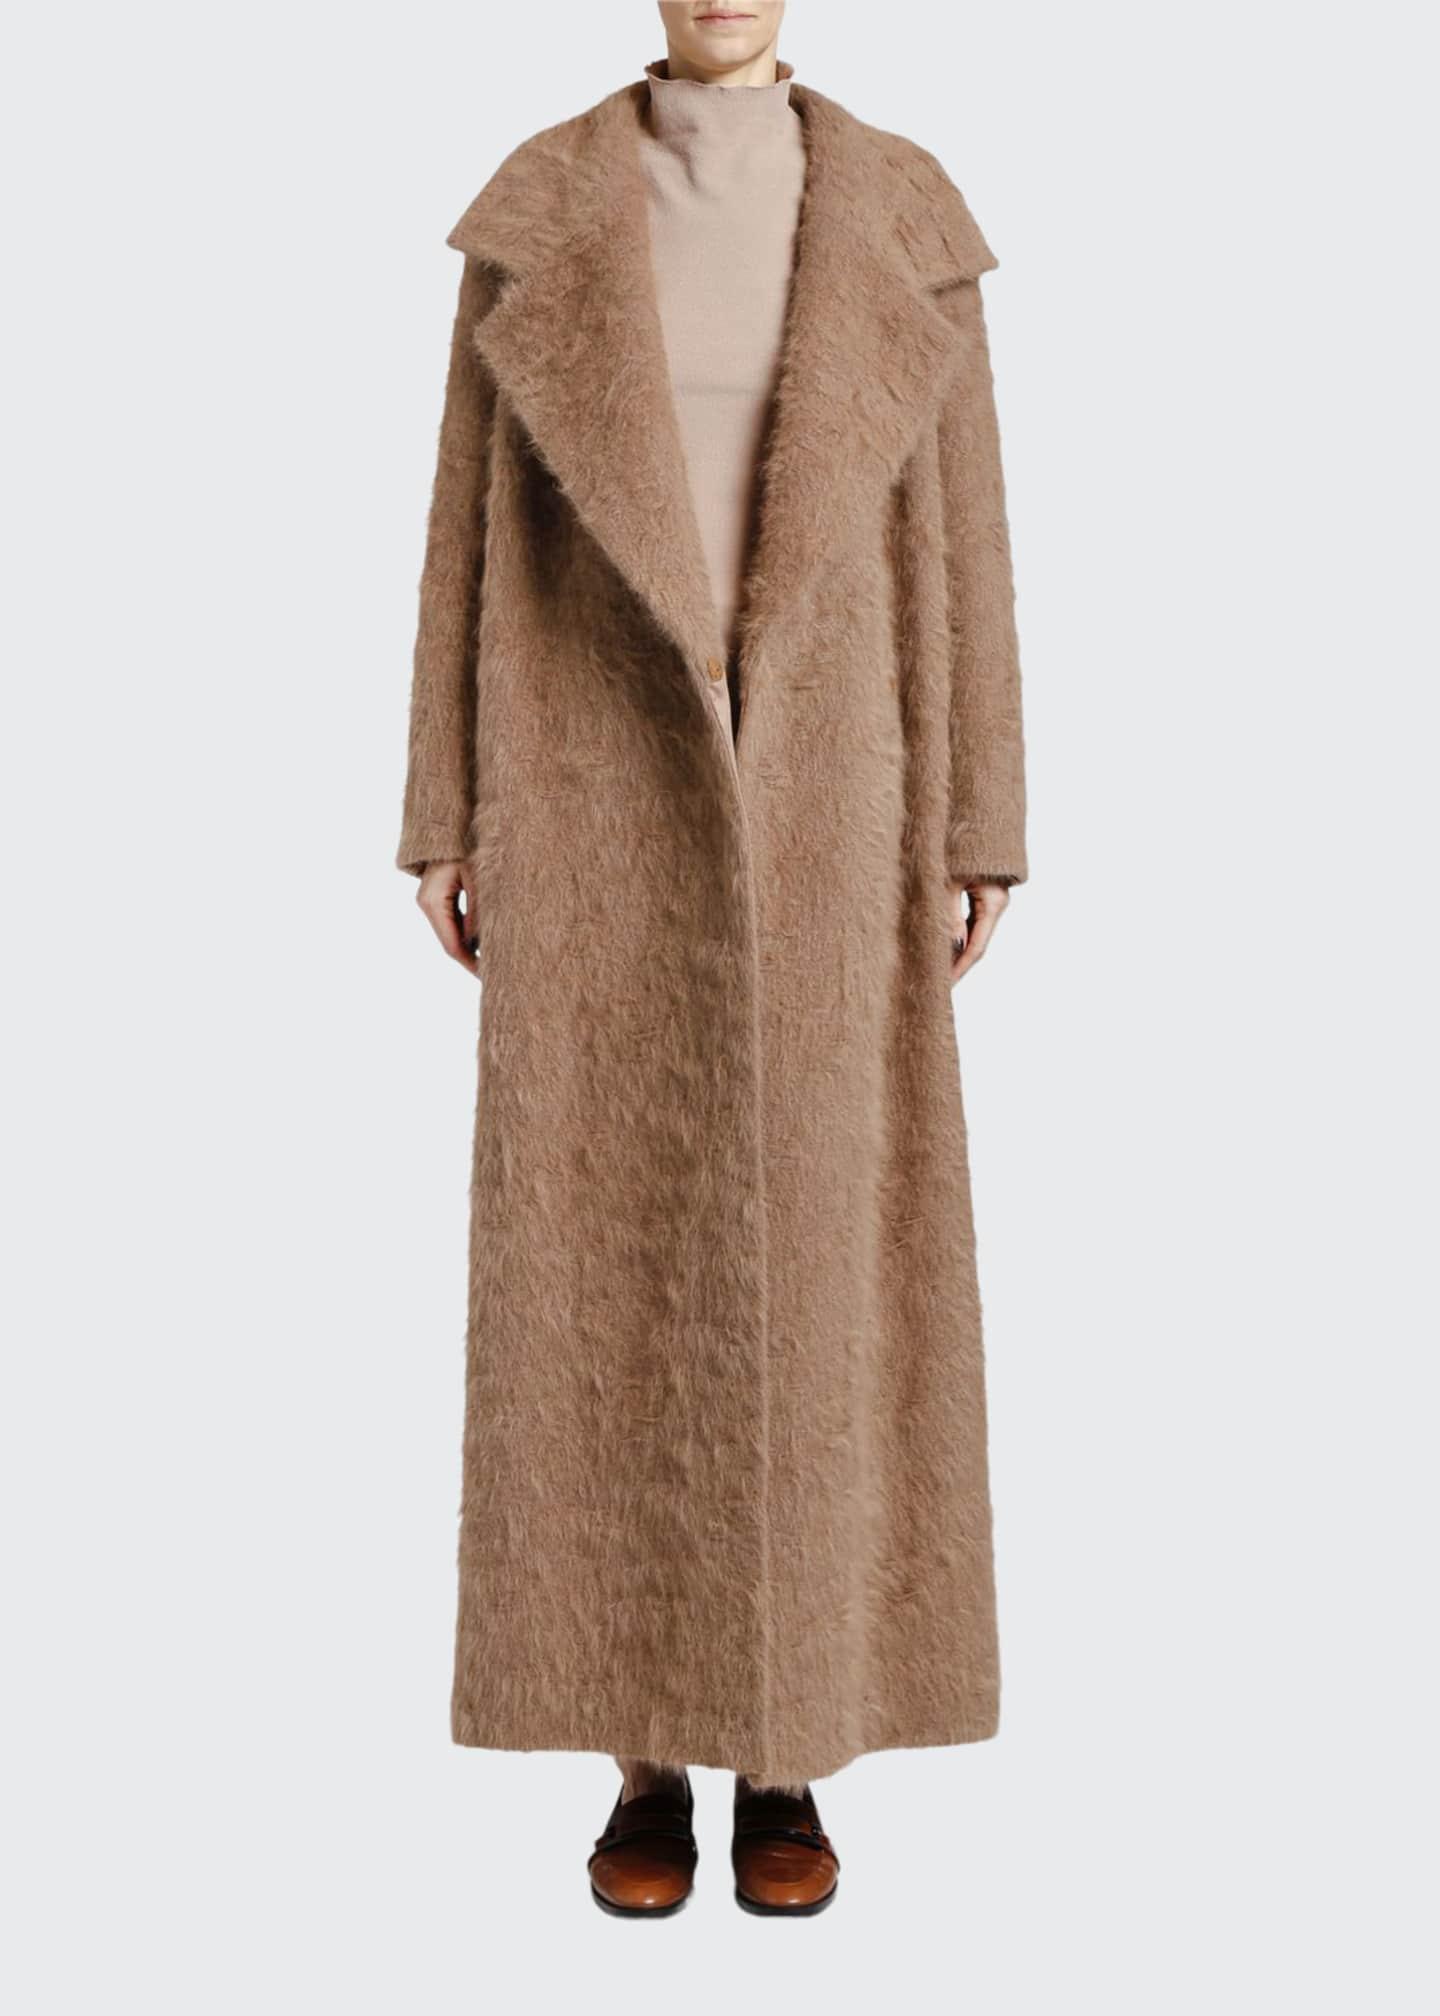 Giorgio Armani Mohair Blend Robe Coat